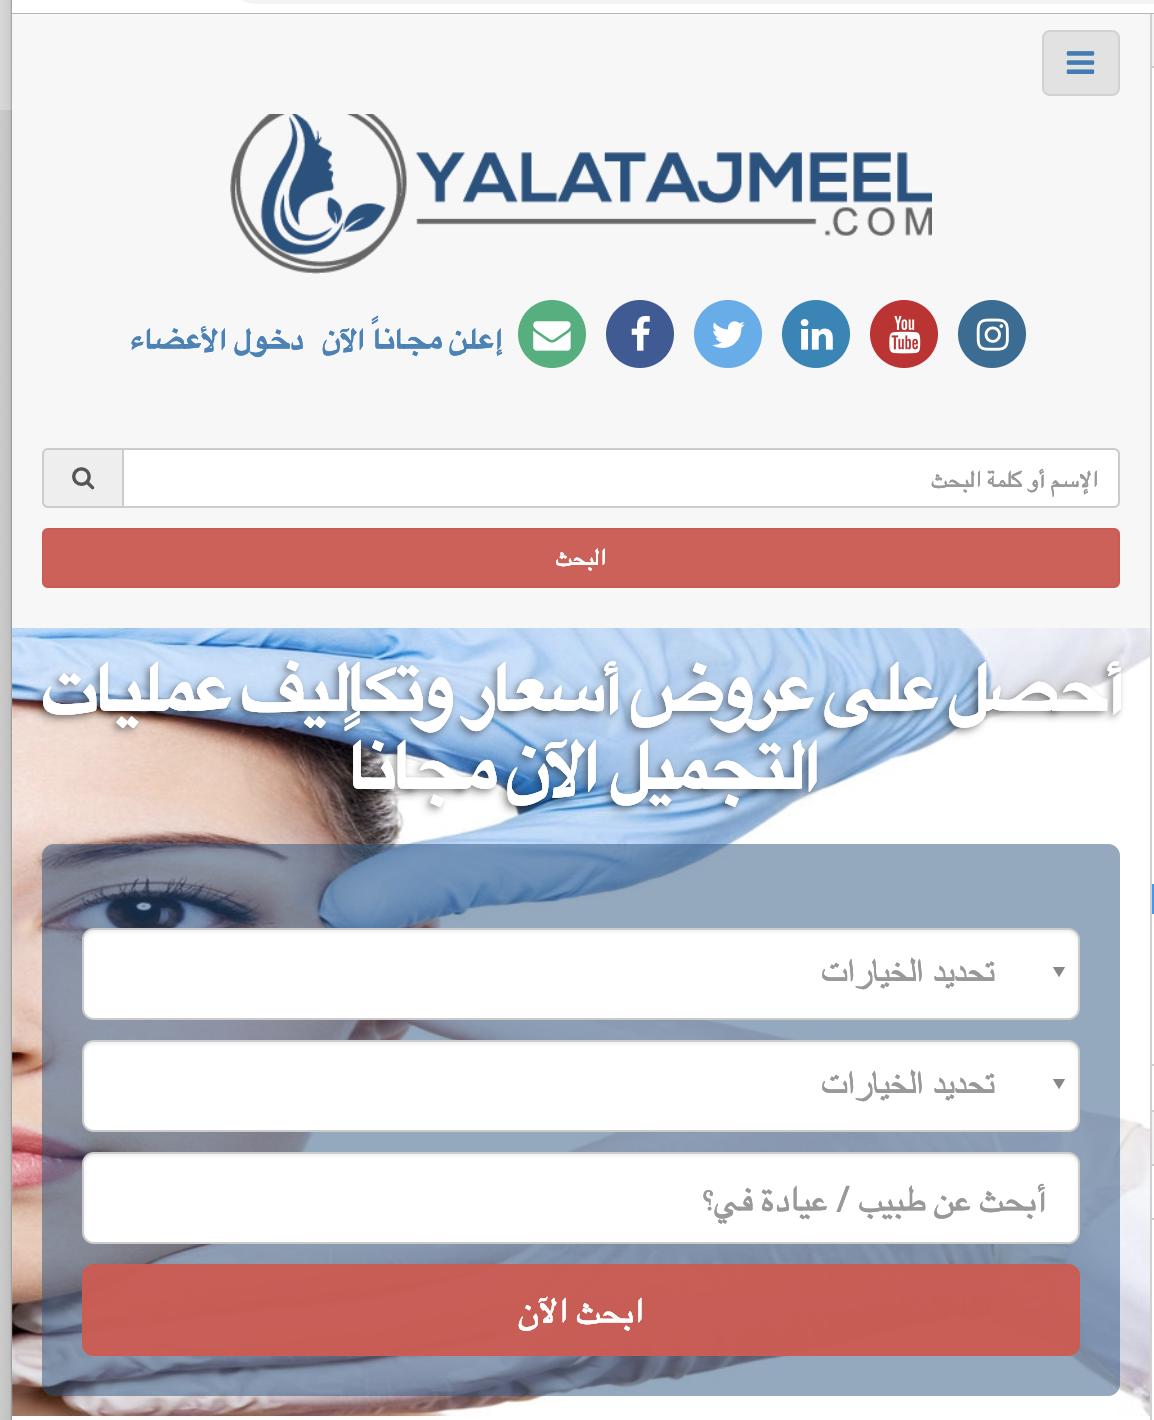 Yalatajmeel Projects To Try Tri Pandora Screenshot